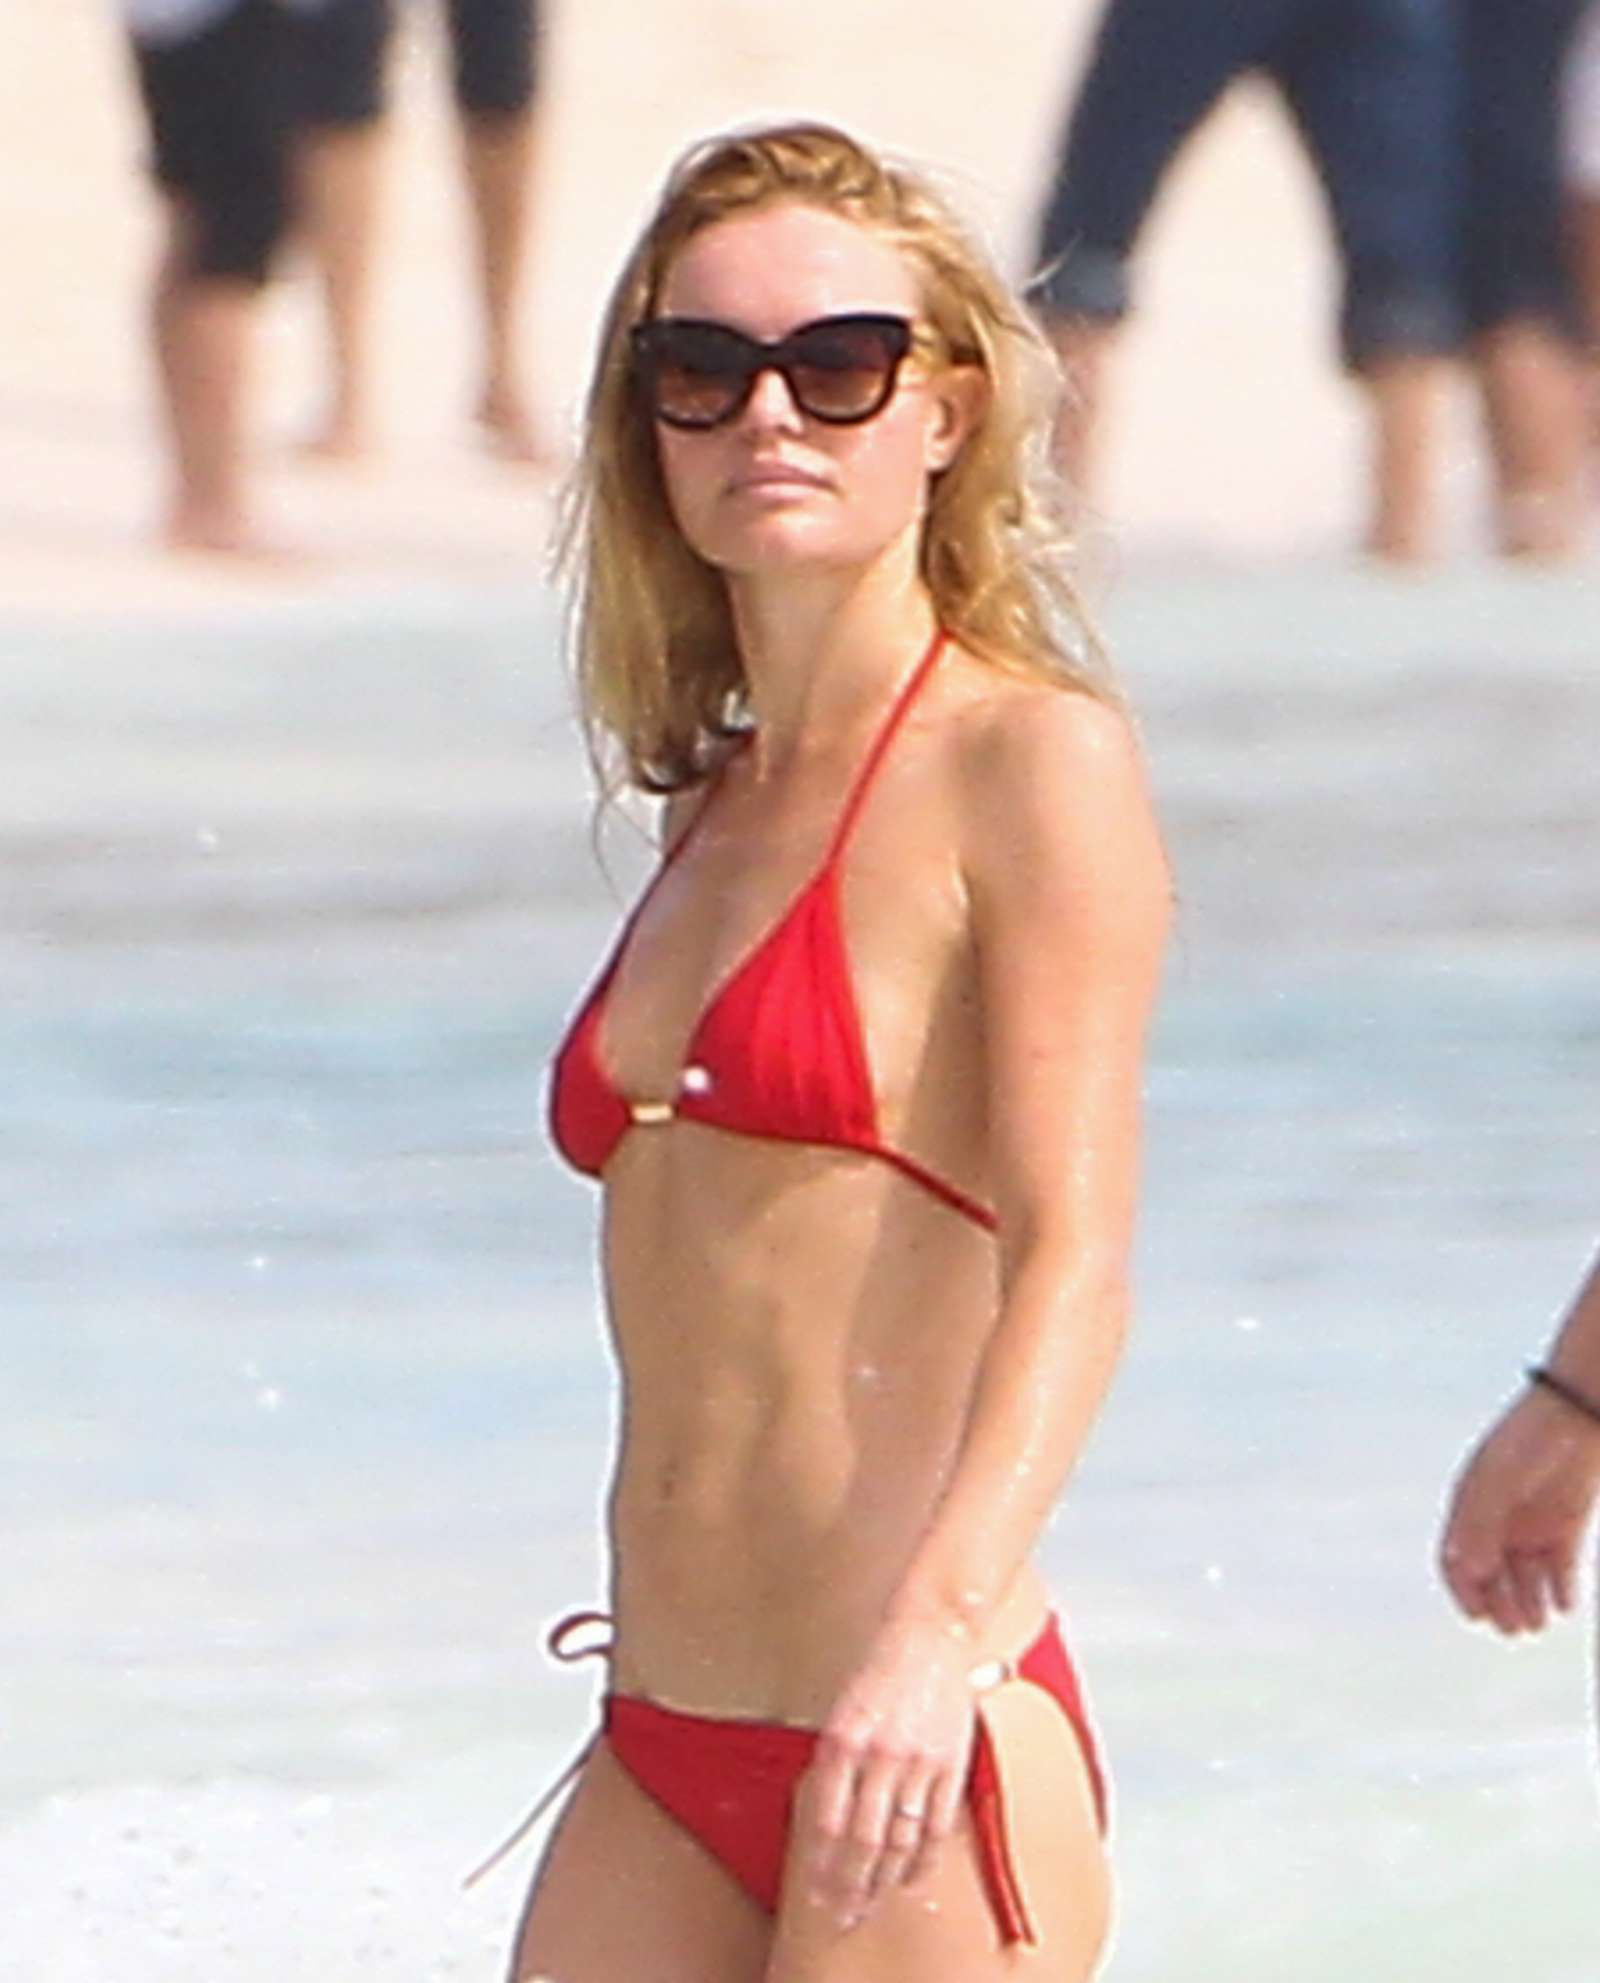 Bikini Kate Bosworth nudes (96 photos), Tits, Paparazzi, Twitter, braless 2006